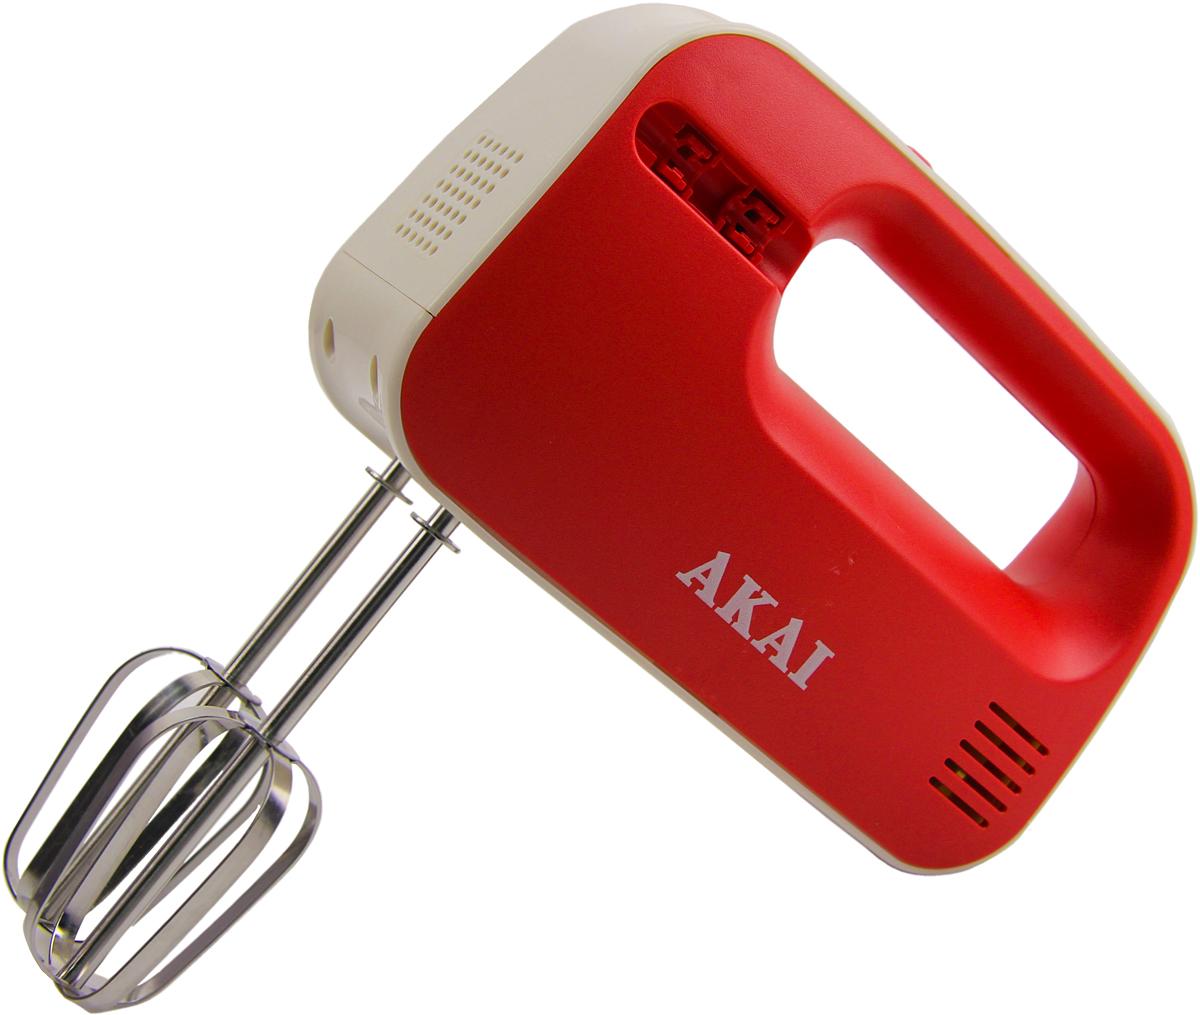 Миксер AKAI 1503RL, красный